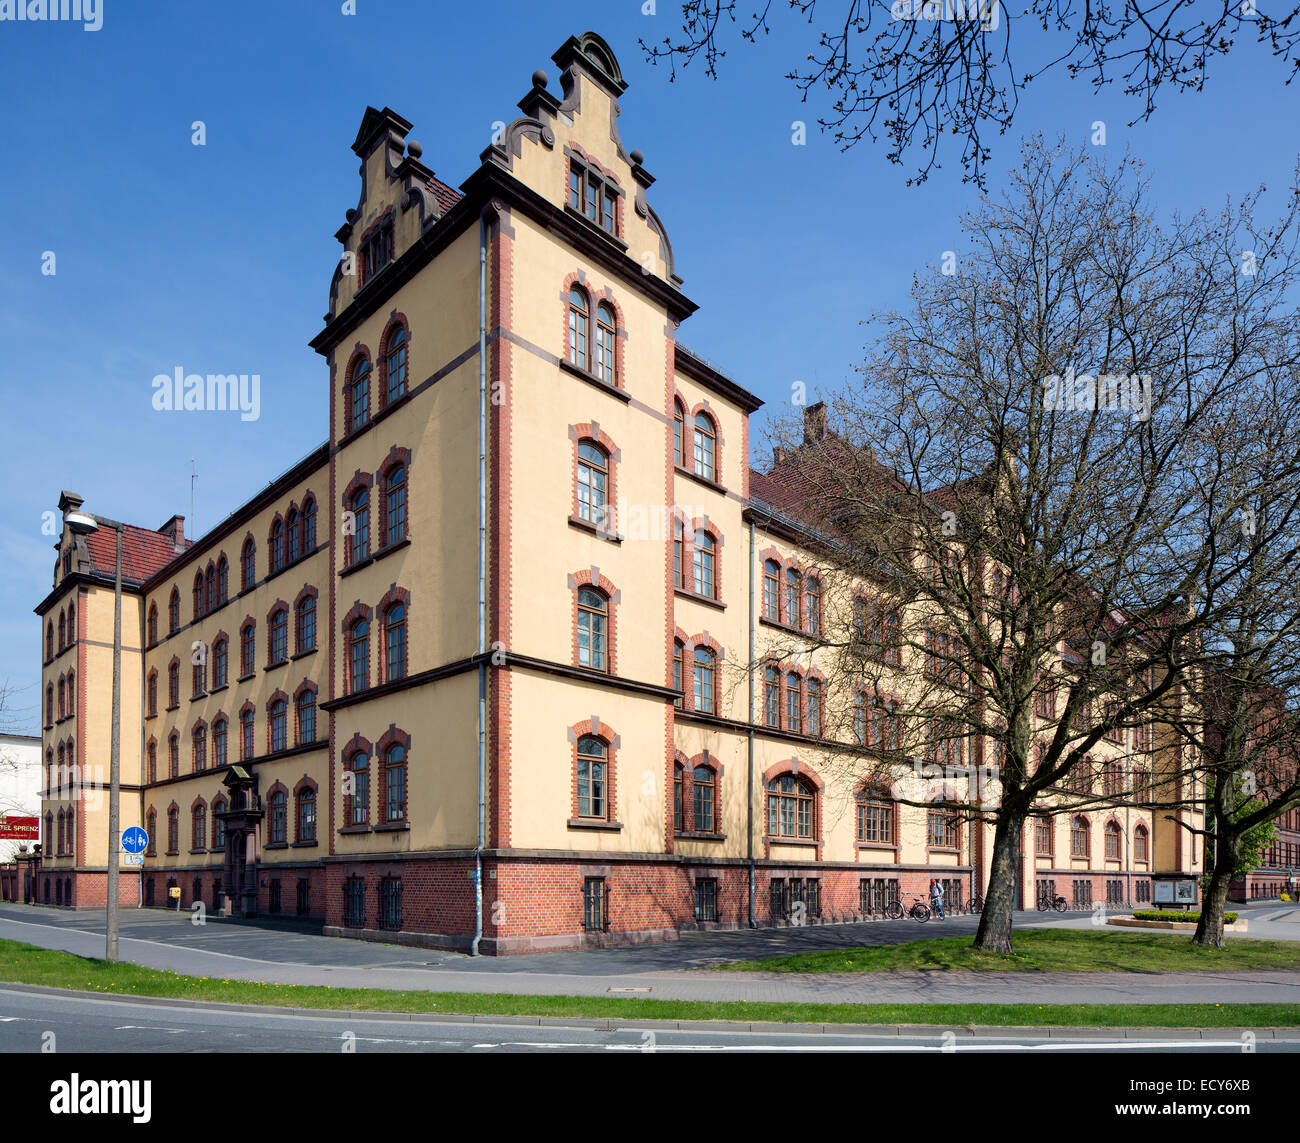 Former barracks at Pferdemarkt square, now Regional Library, Oldenburg, Lower Saxony, Germany - Stock Image